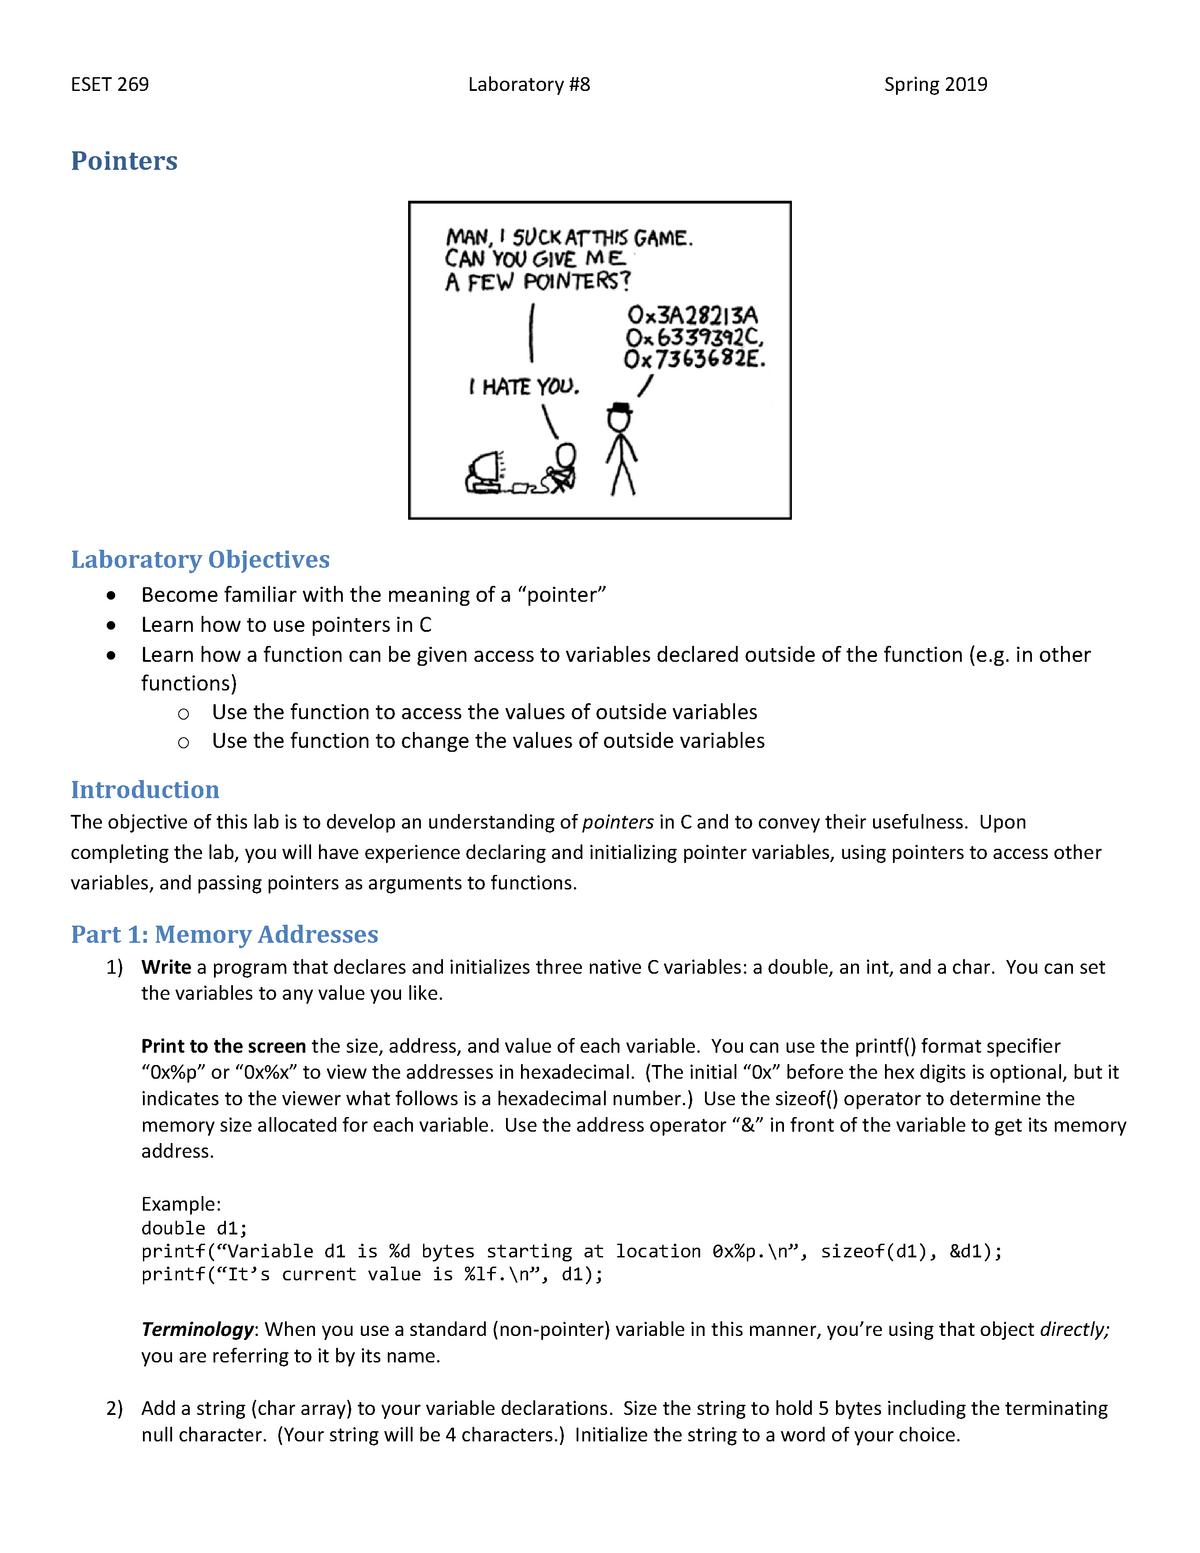 Lab 8 - Lab 8 - ESET 269: Introduction to C - StuDocu